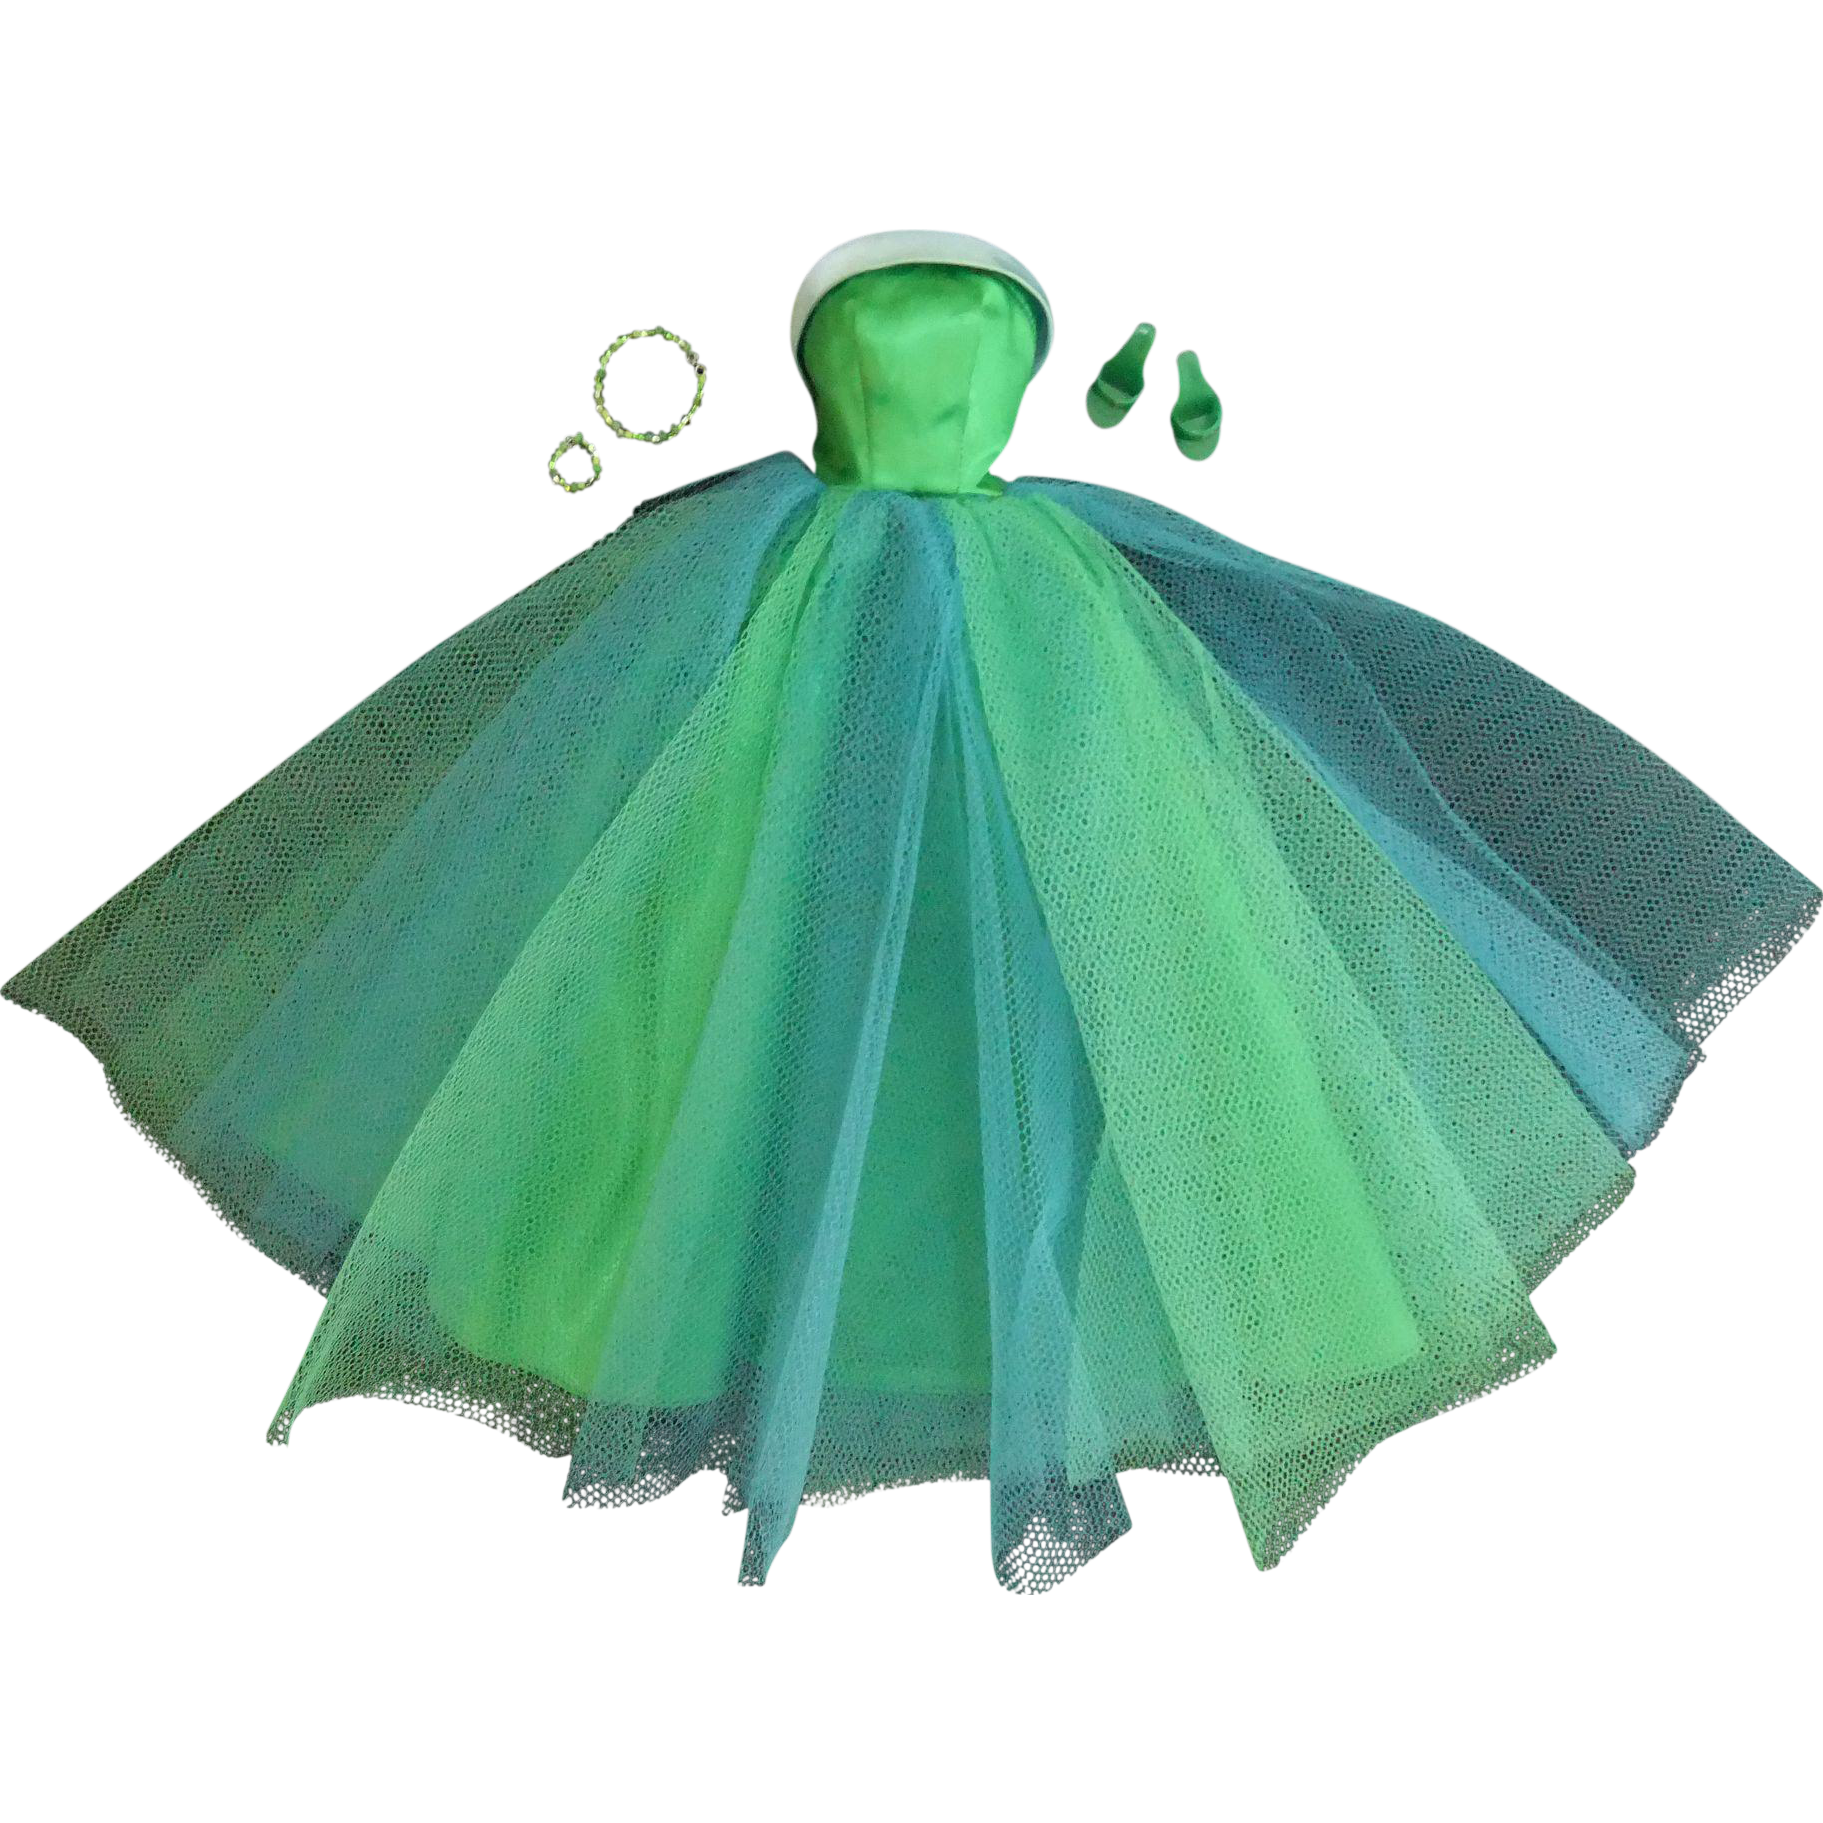 Vintage Mattel Barbie Senior Prom #951, 1963-64